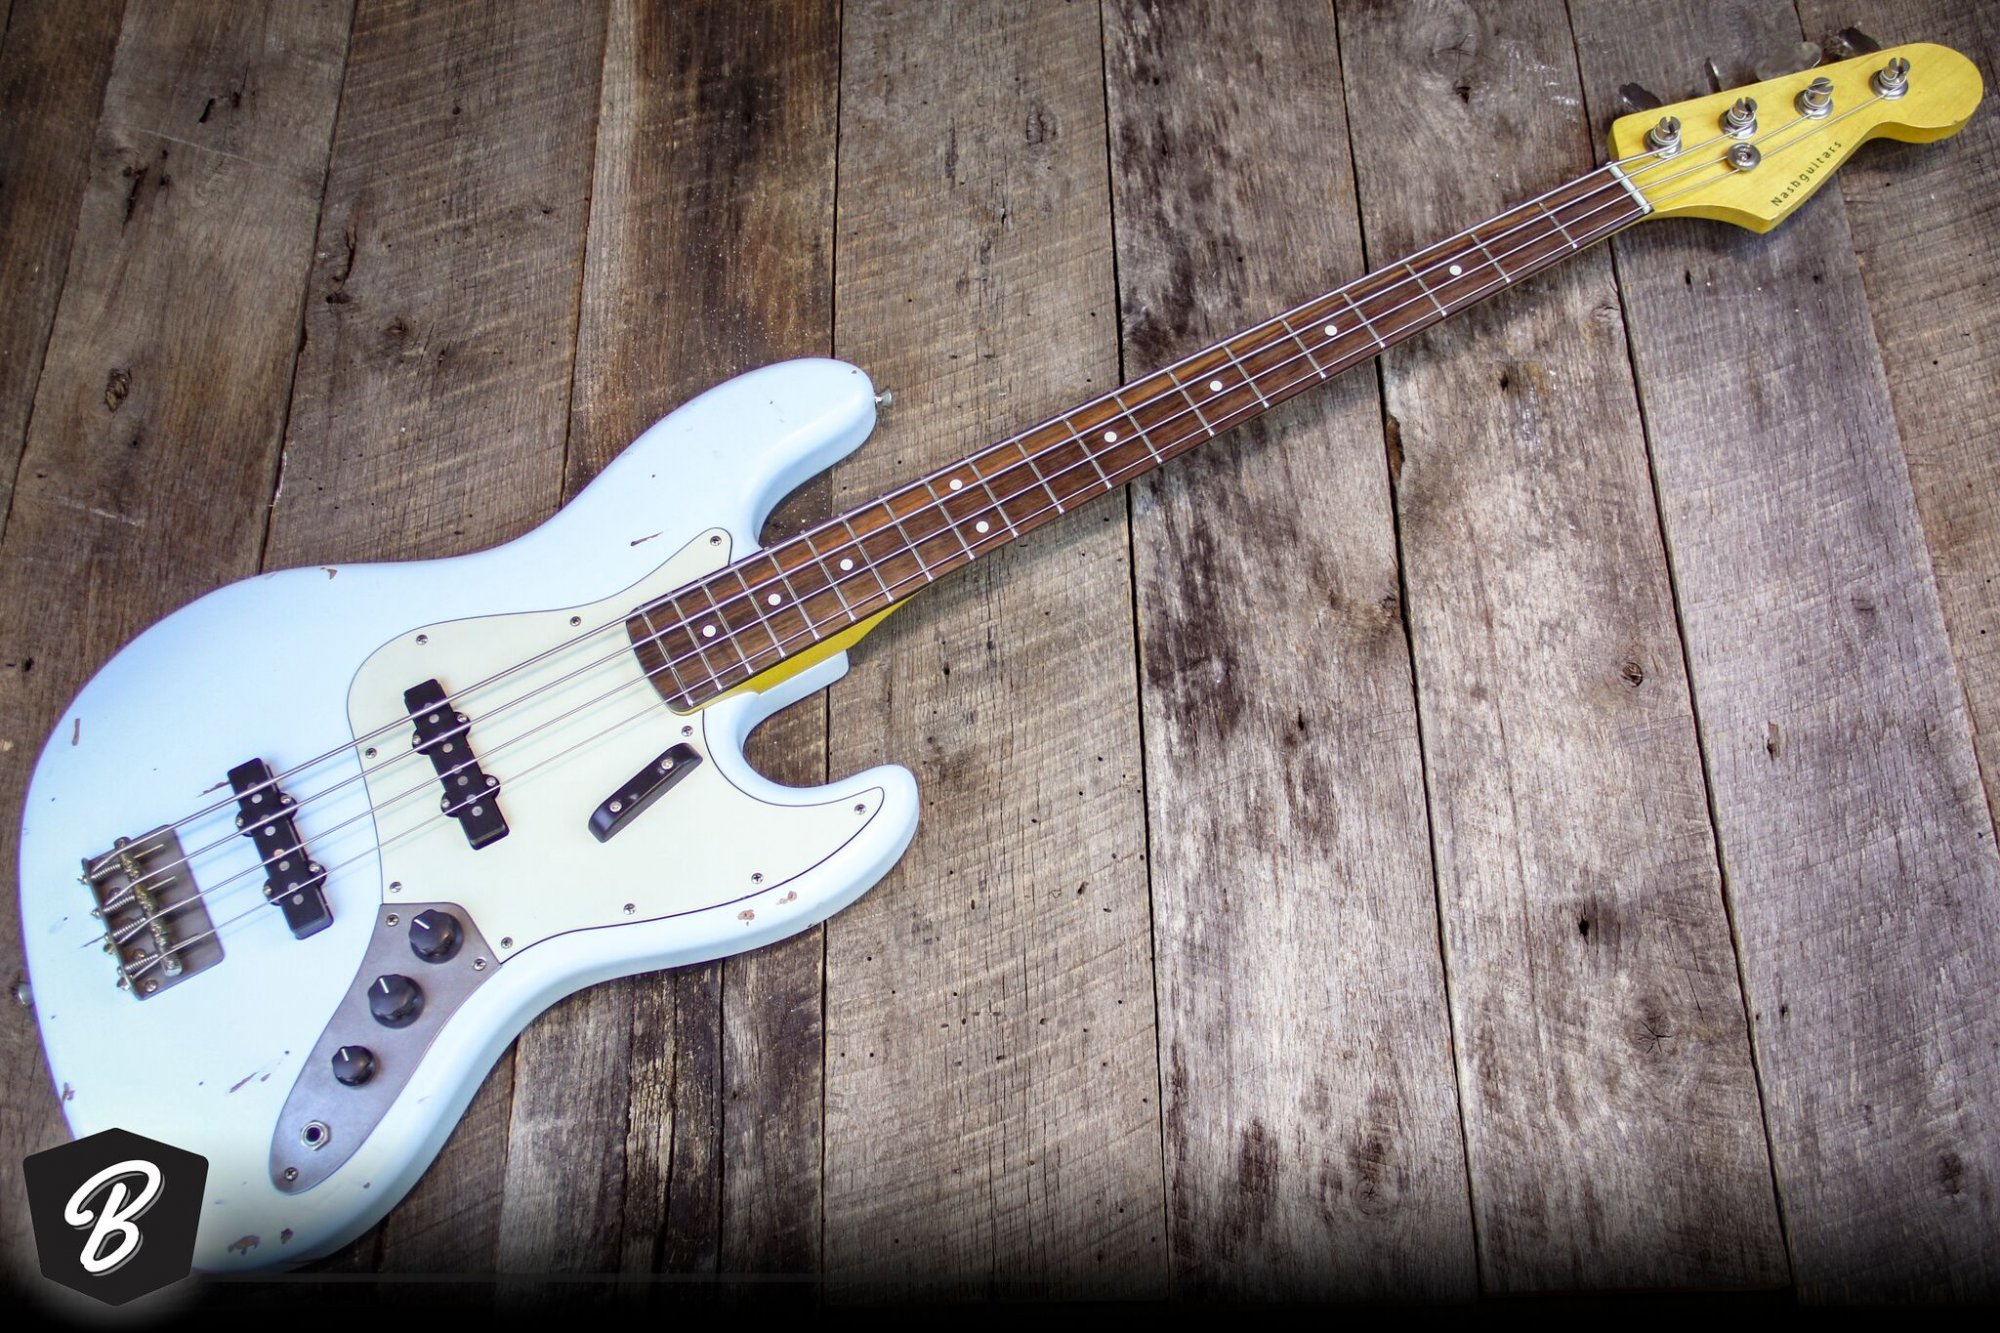 Nash JB63 Bass in Sonic Blue, Alder Body